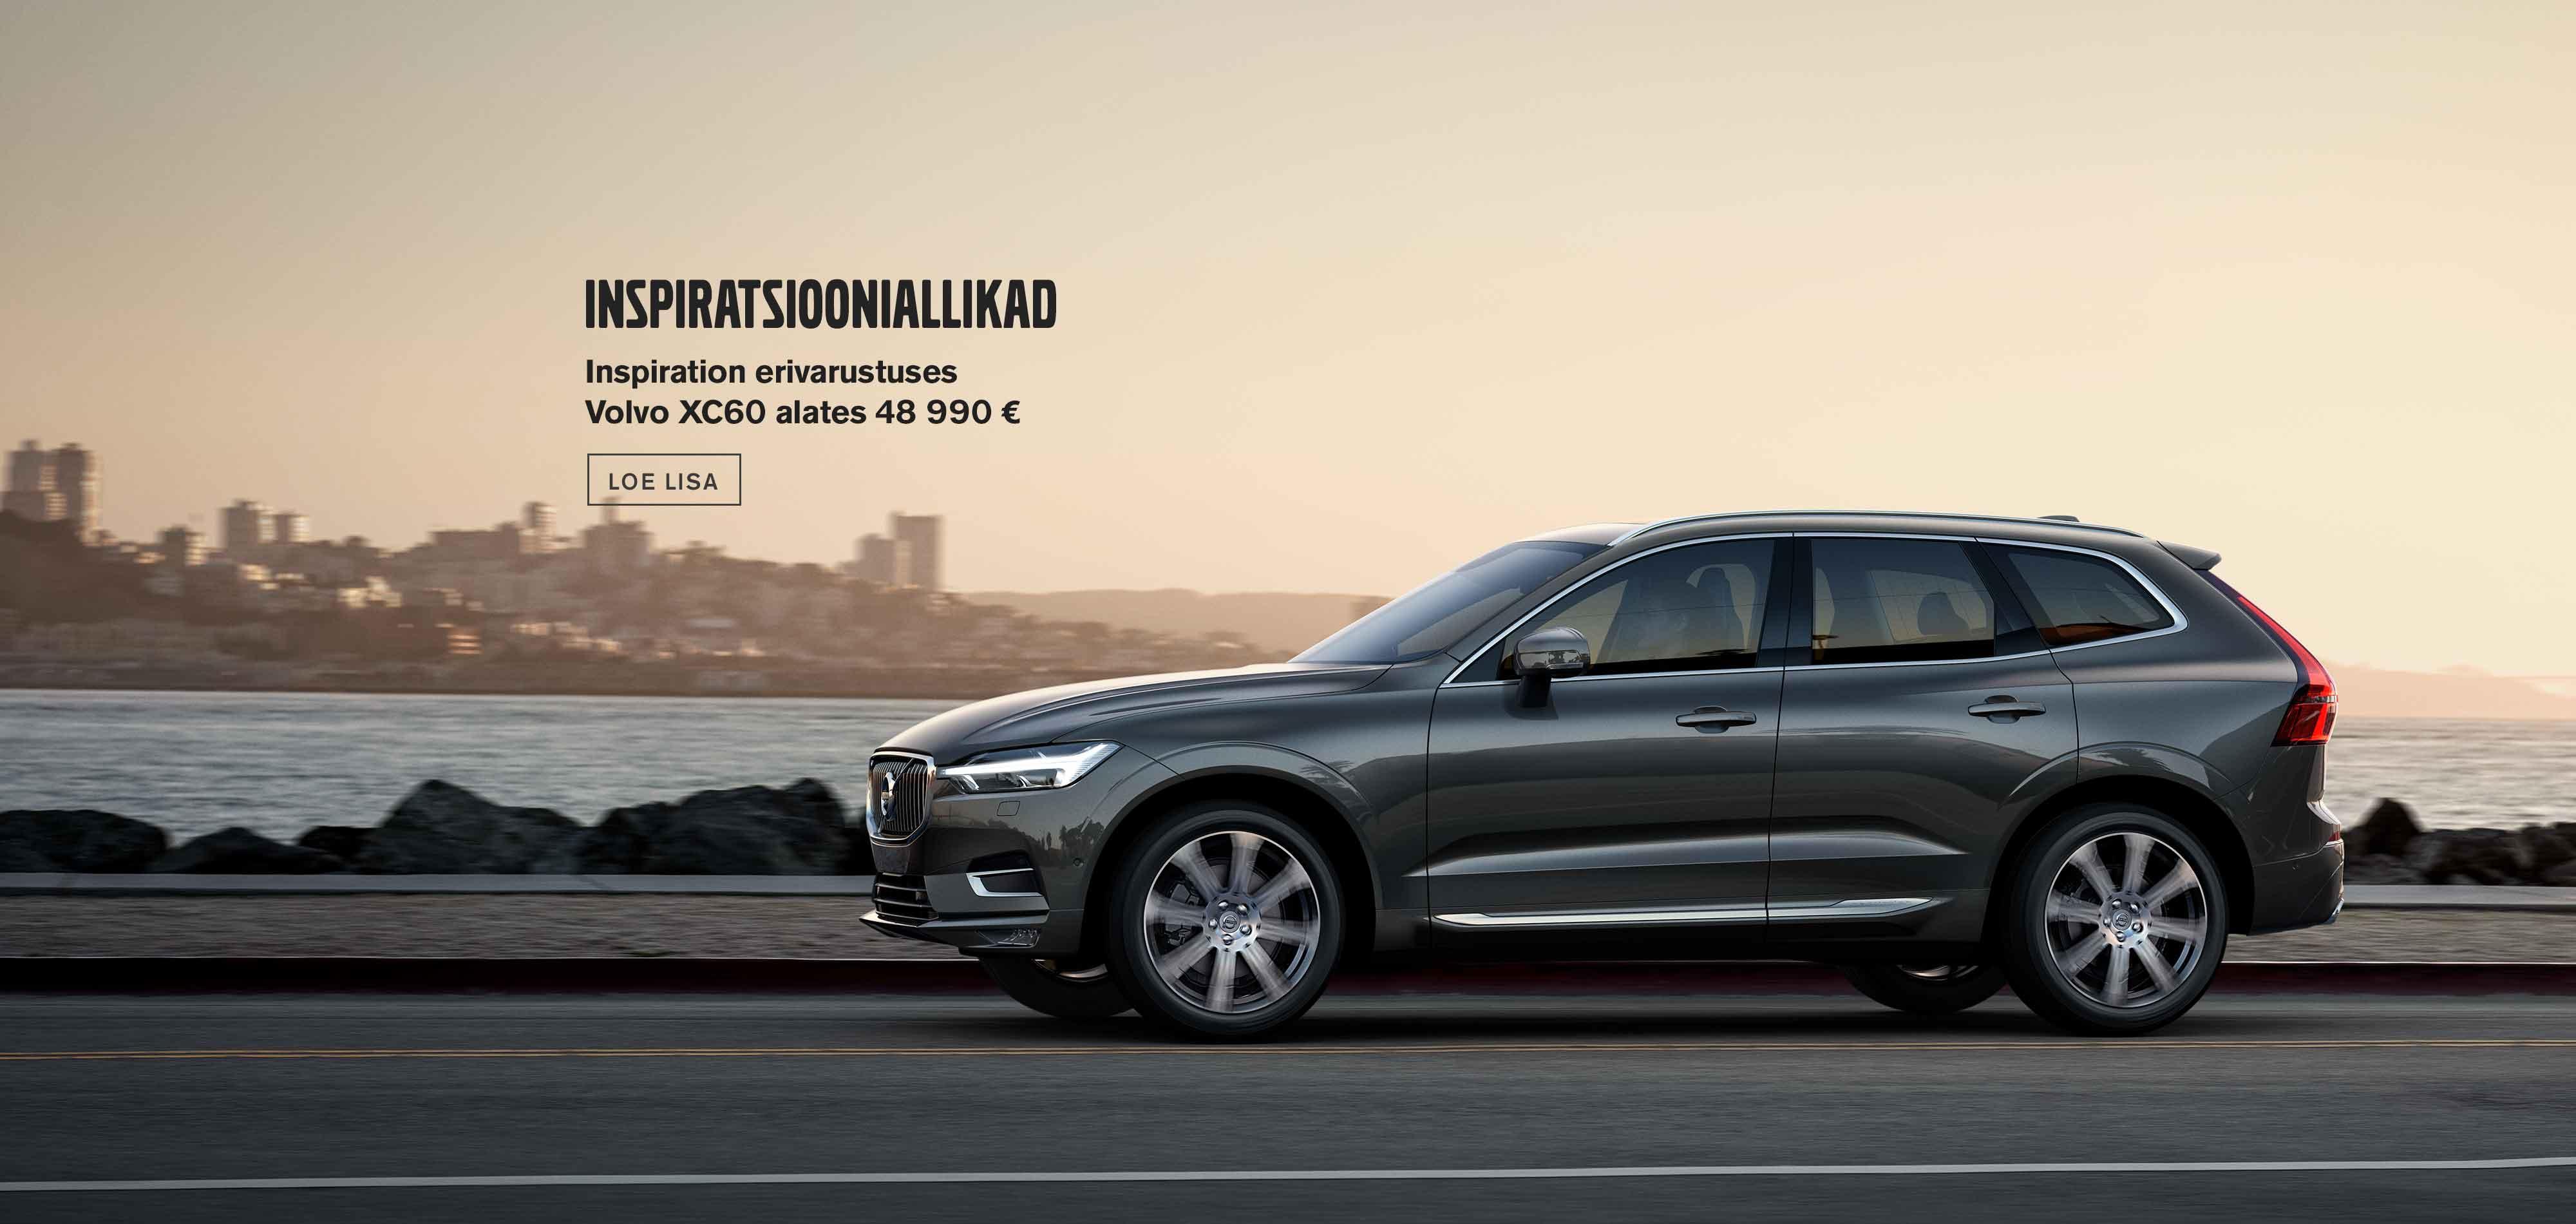 Inspiratsiooniallikad - Volvo XC60